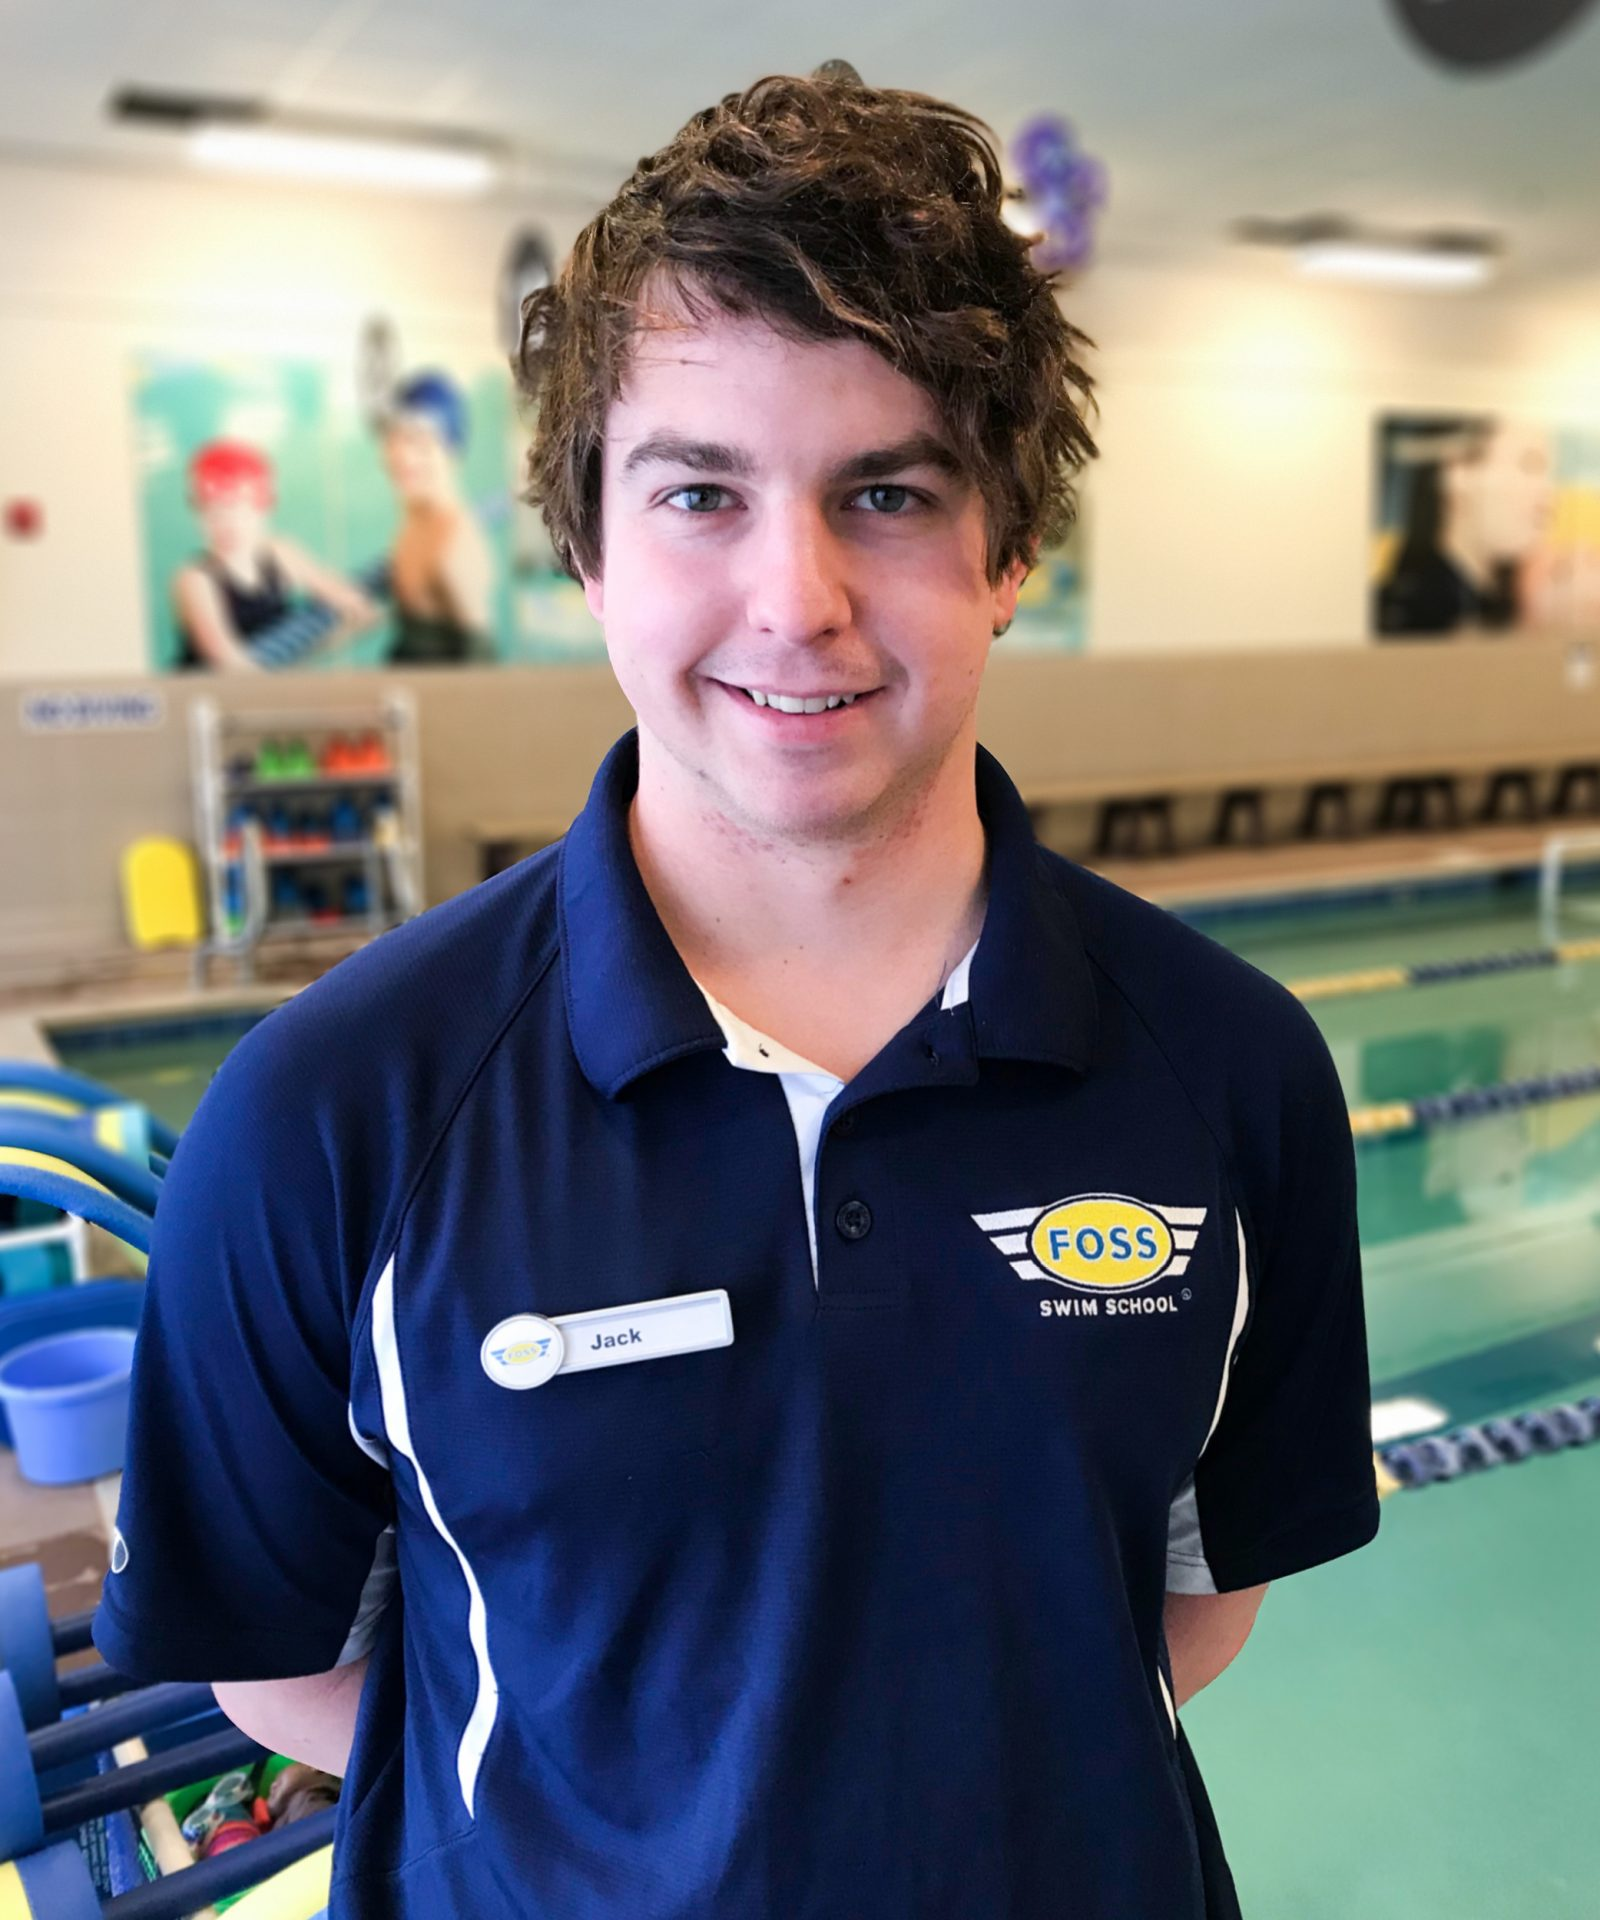 Sarajane - Shift Coordinator at FOSS Swim School